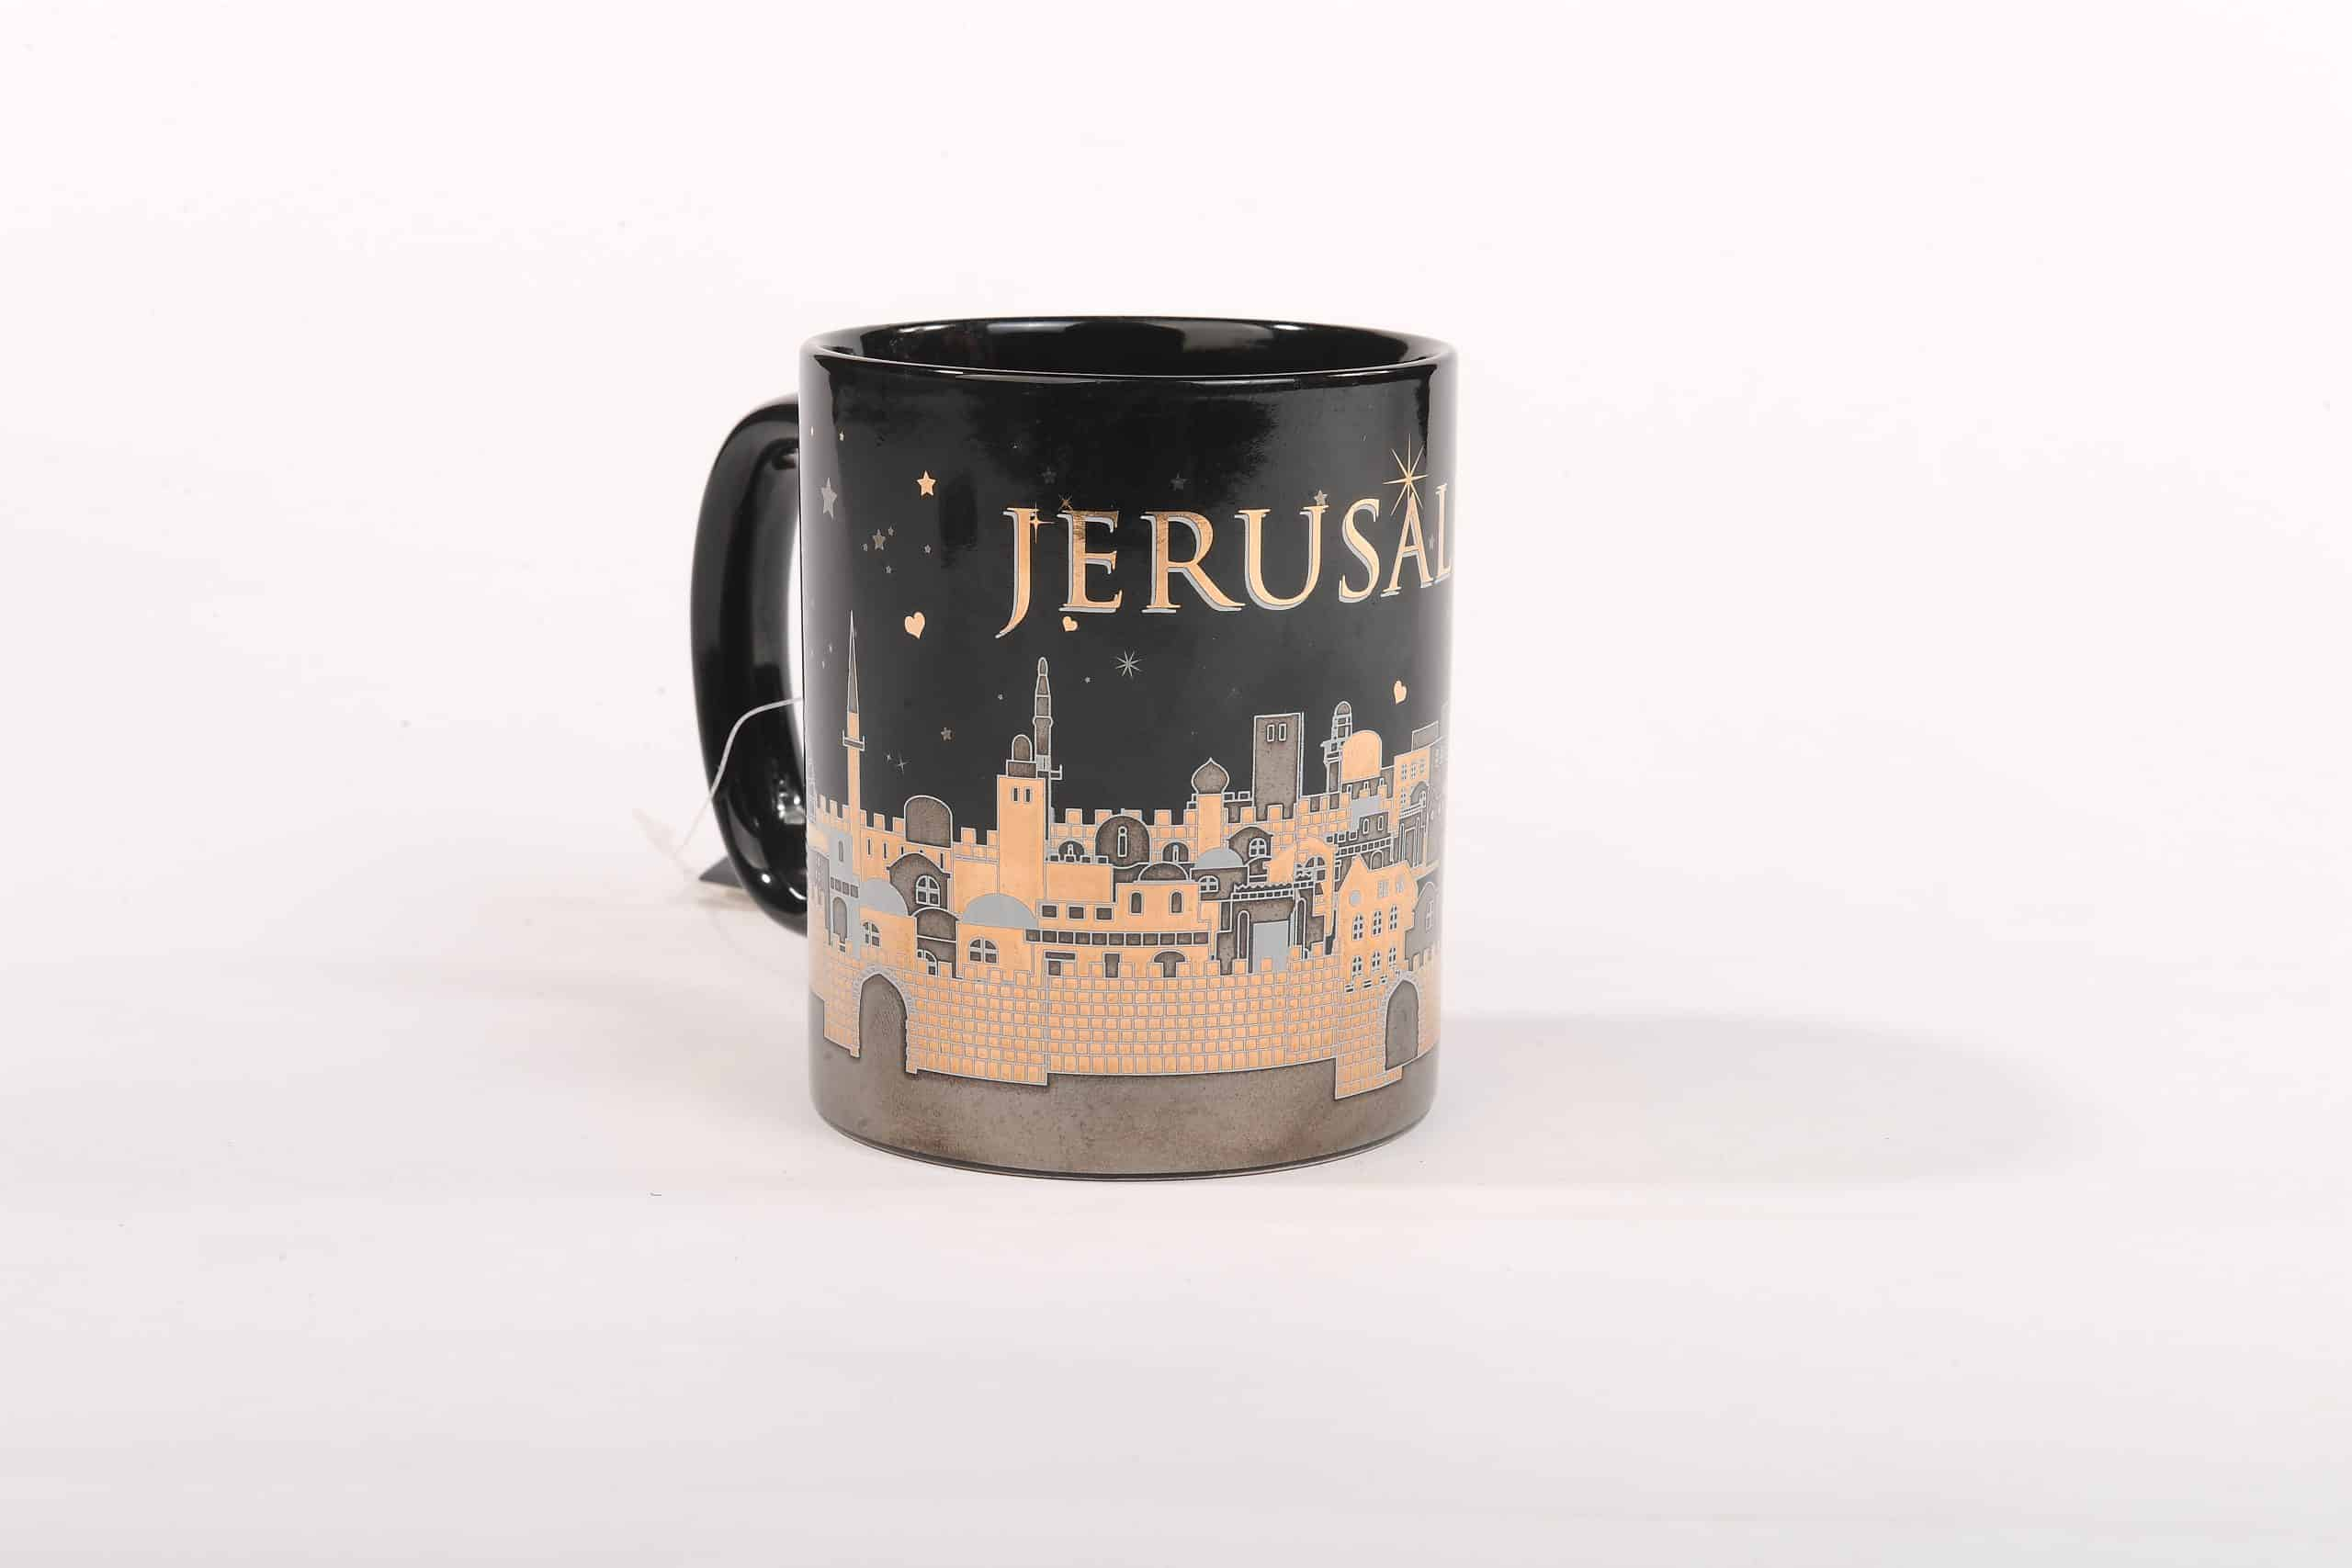 Jerusalem' Old City Coffee Mug Black - Made in Israel